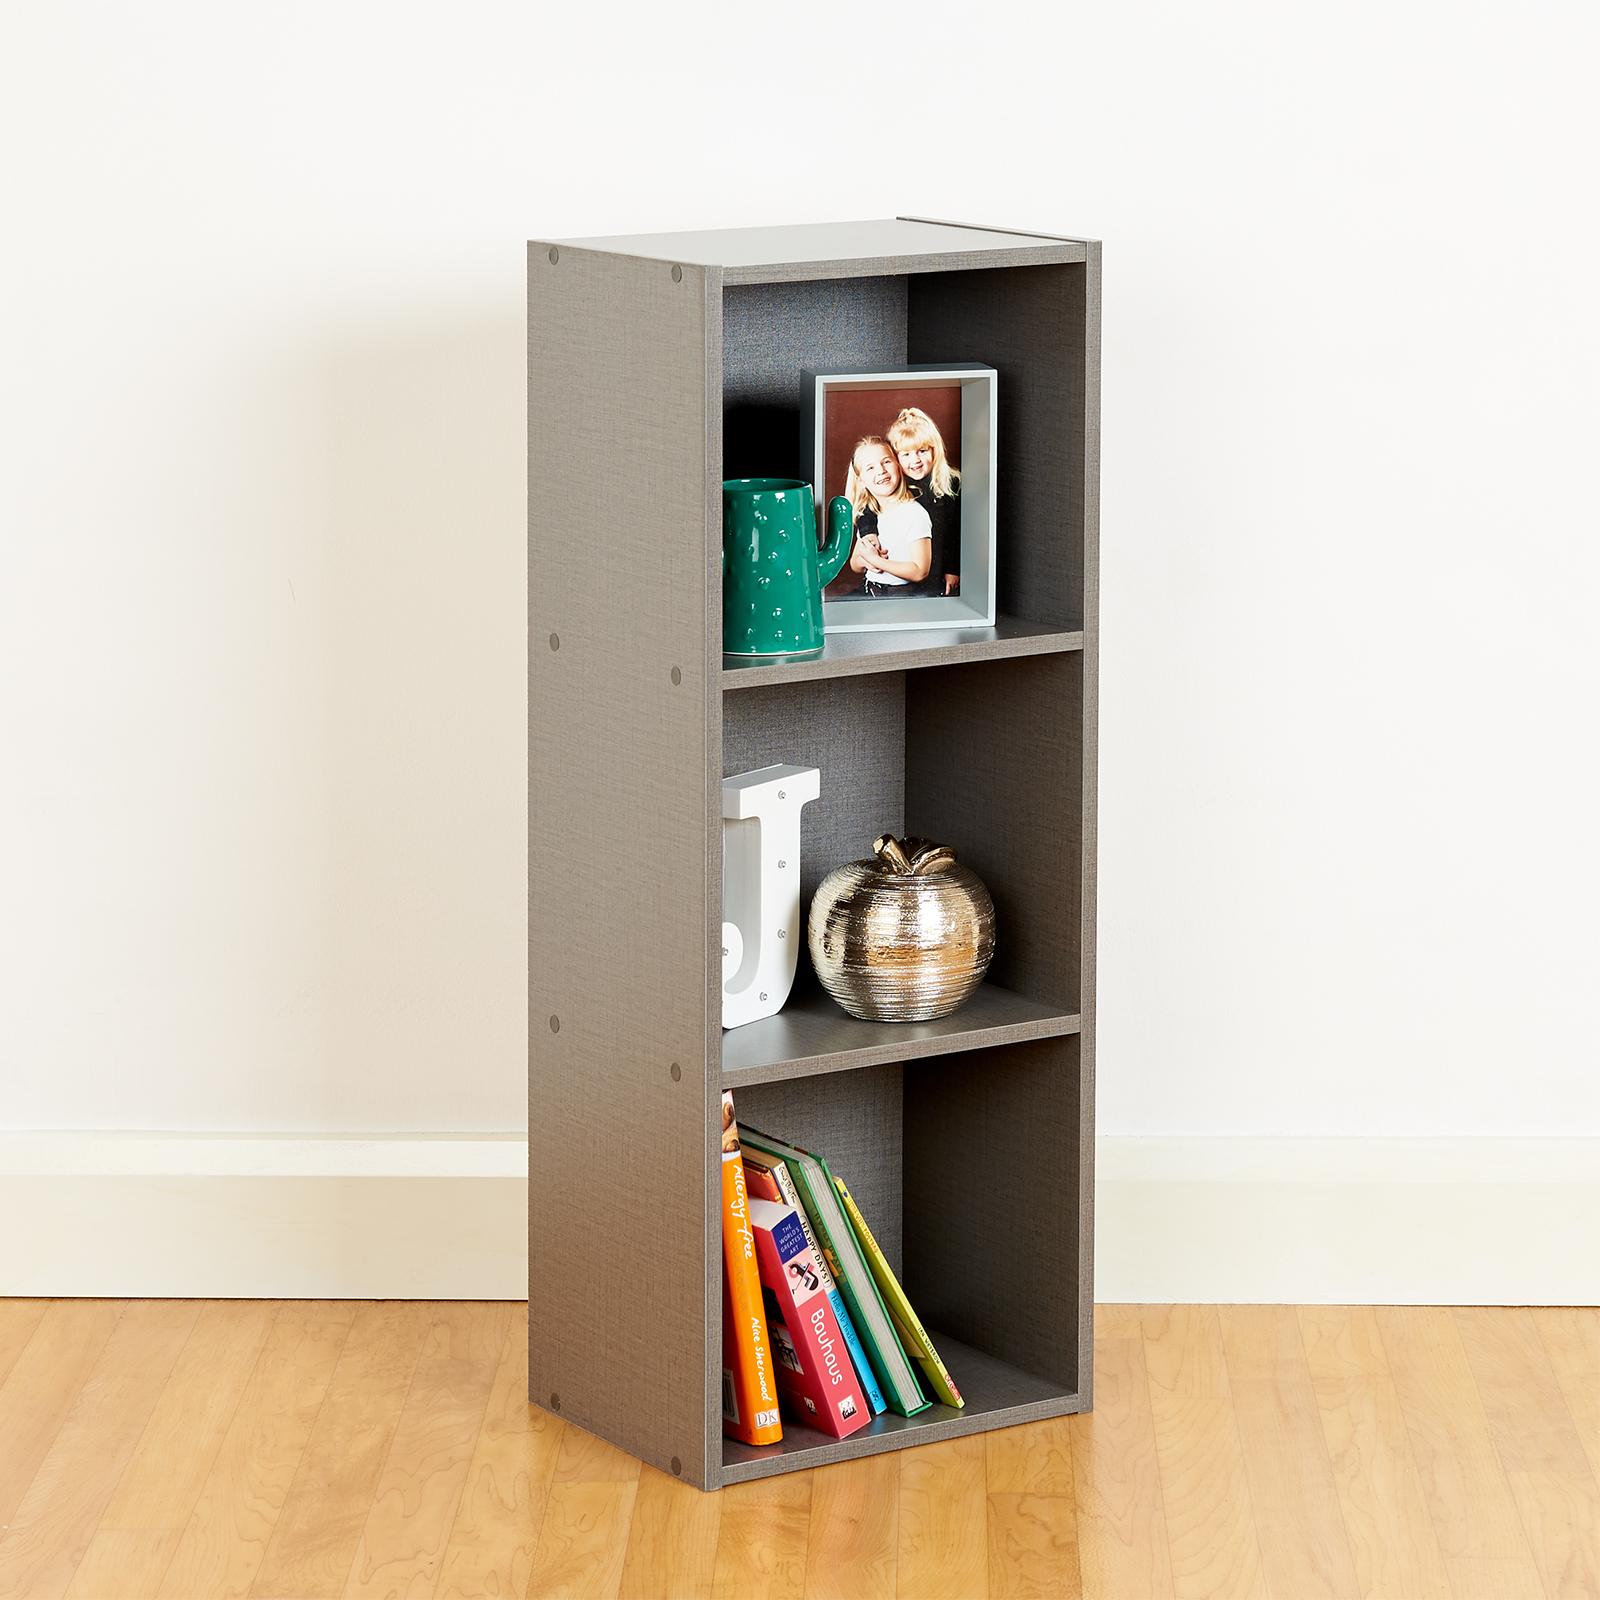 3 Tier Wooden Grey Cube Bookcase Storage Display Unit Modular ...